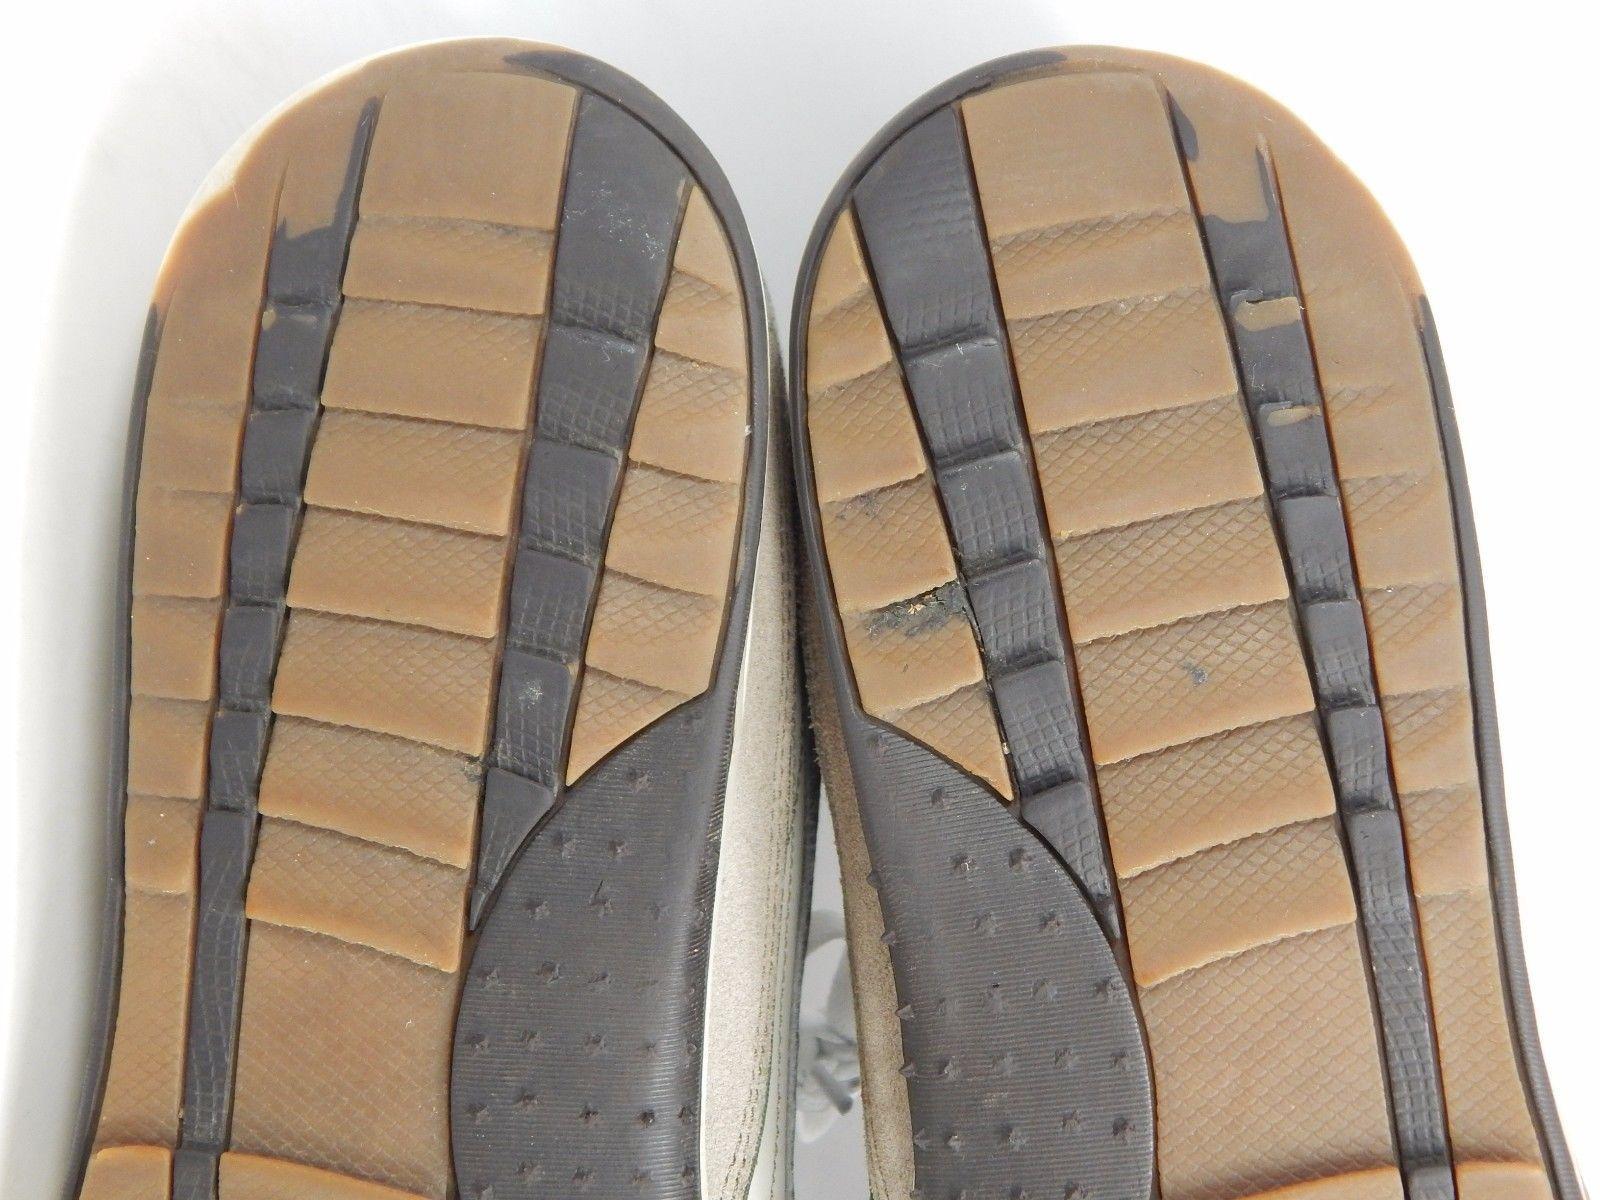 Skechers Ascoli piceno Men's Casual Shoes Size US 12 M (D) EU 46 Beige/Brown